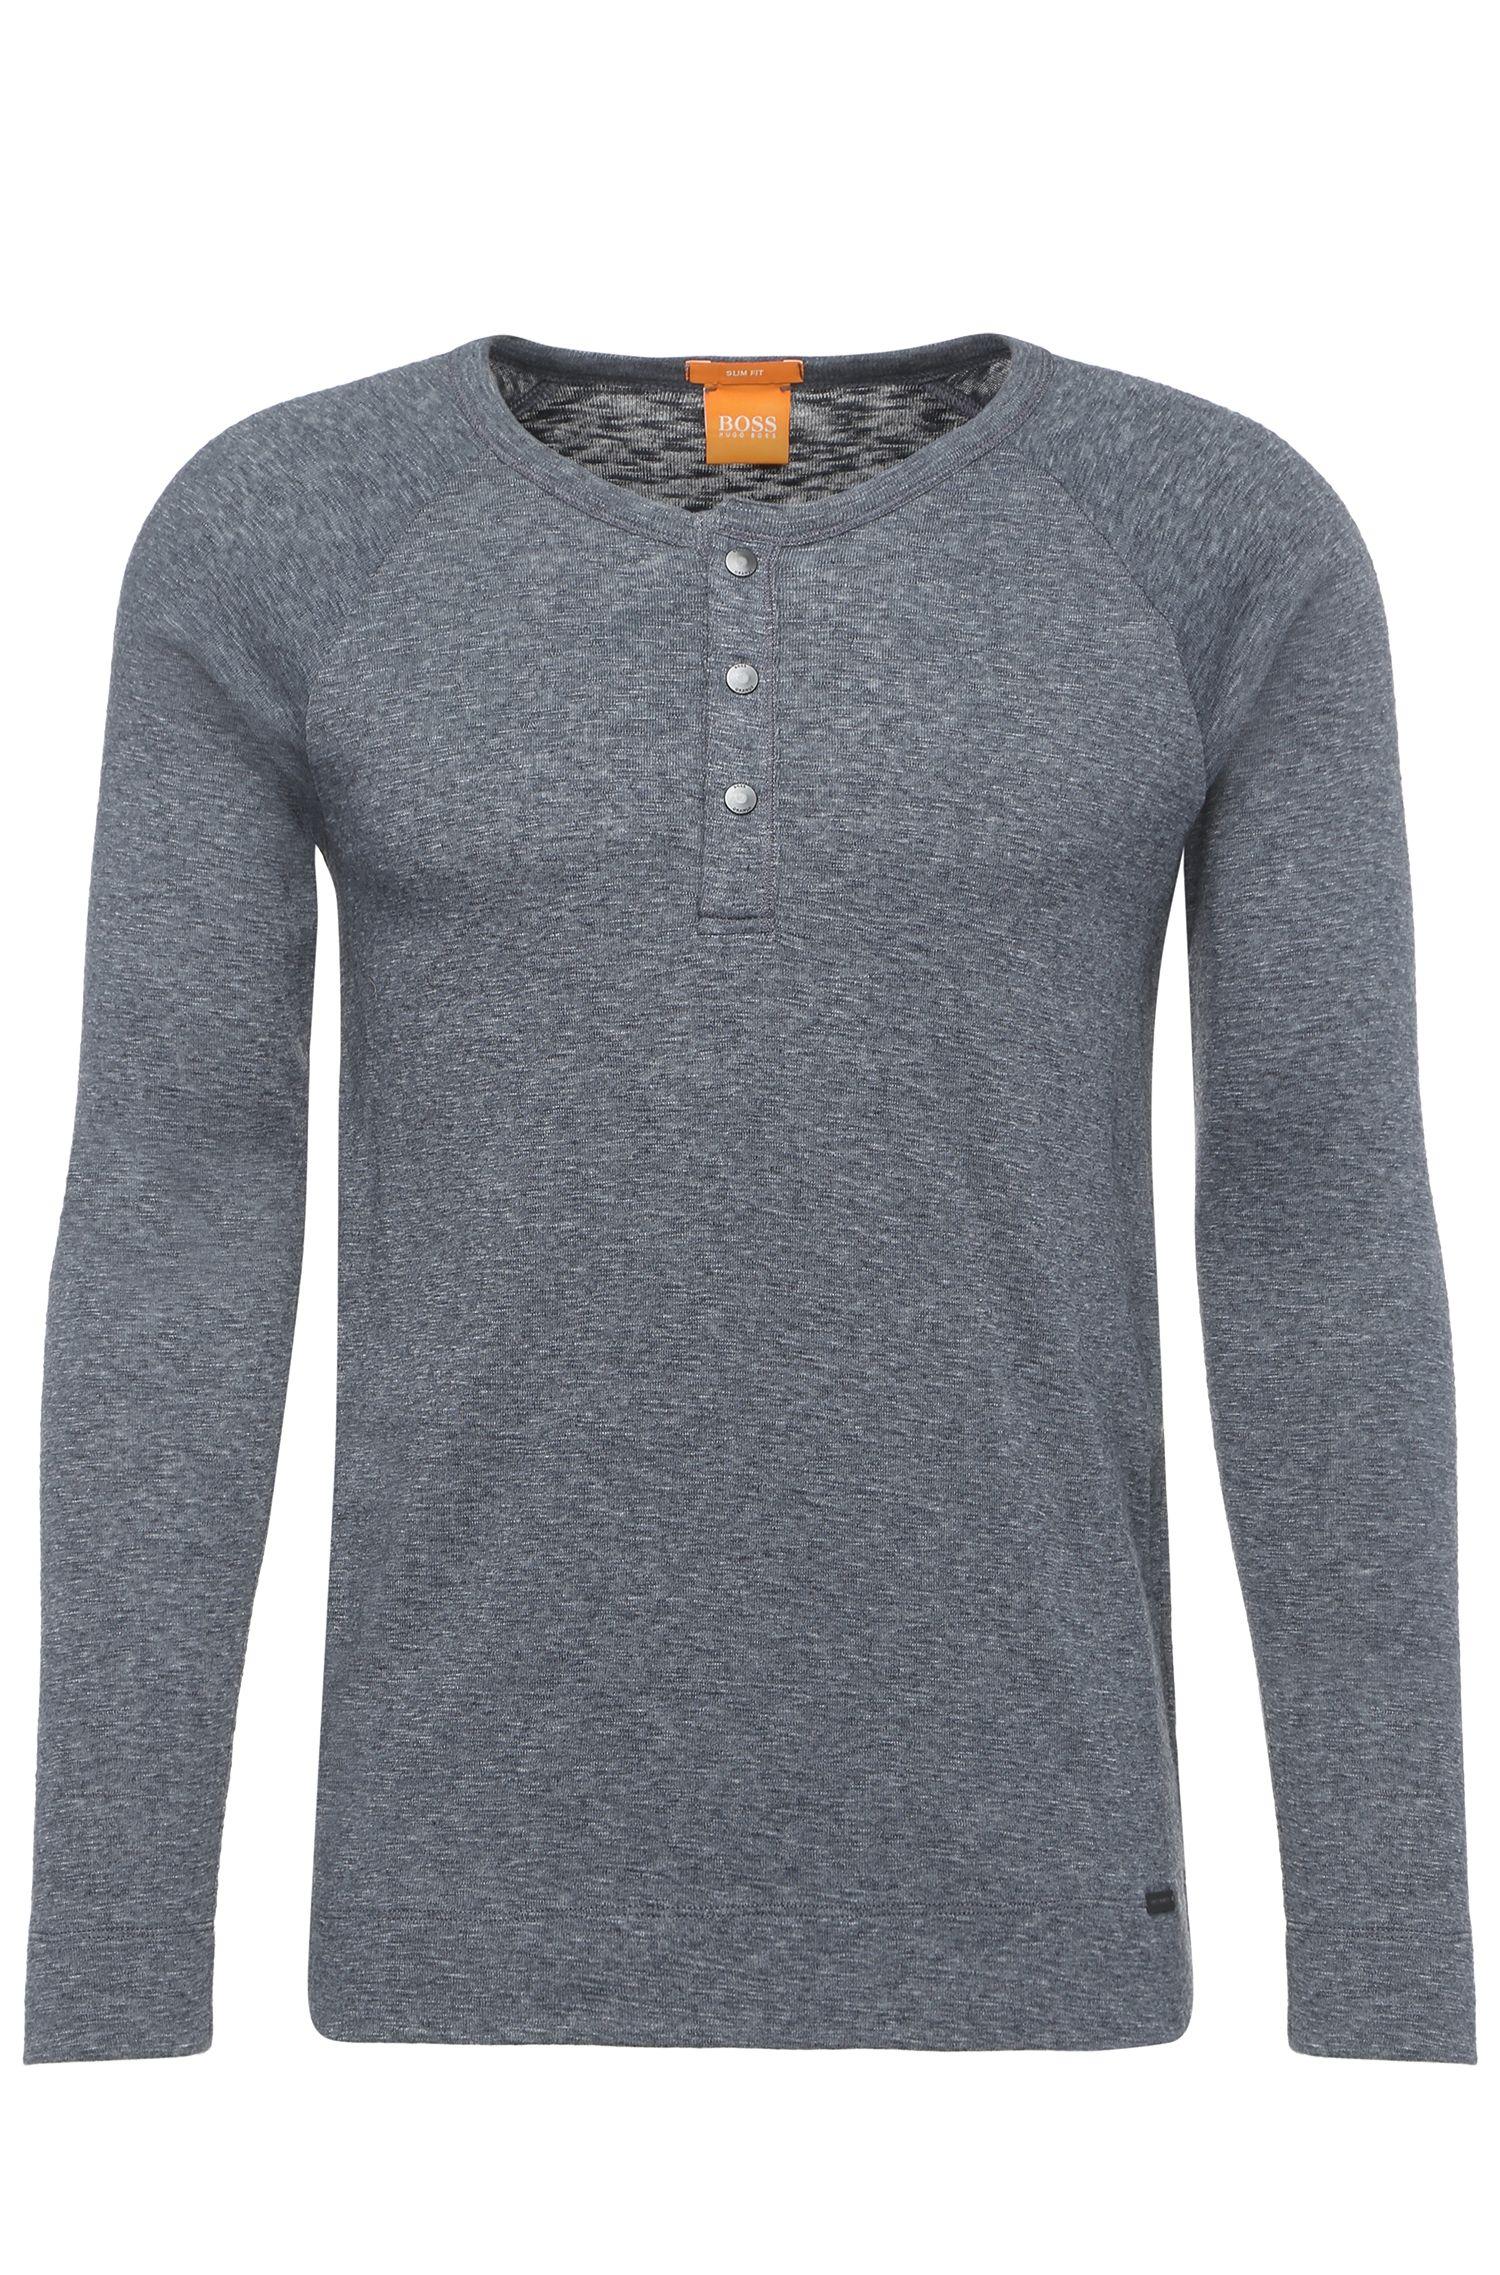 'Tambow' | Cotton Blend Long Sleeve Burnout T-Shirt